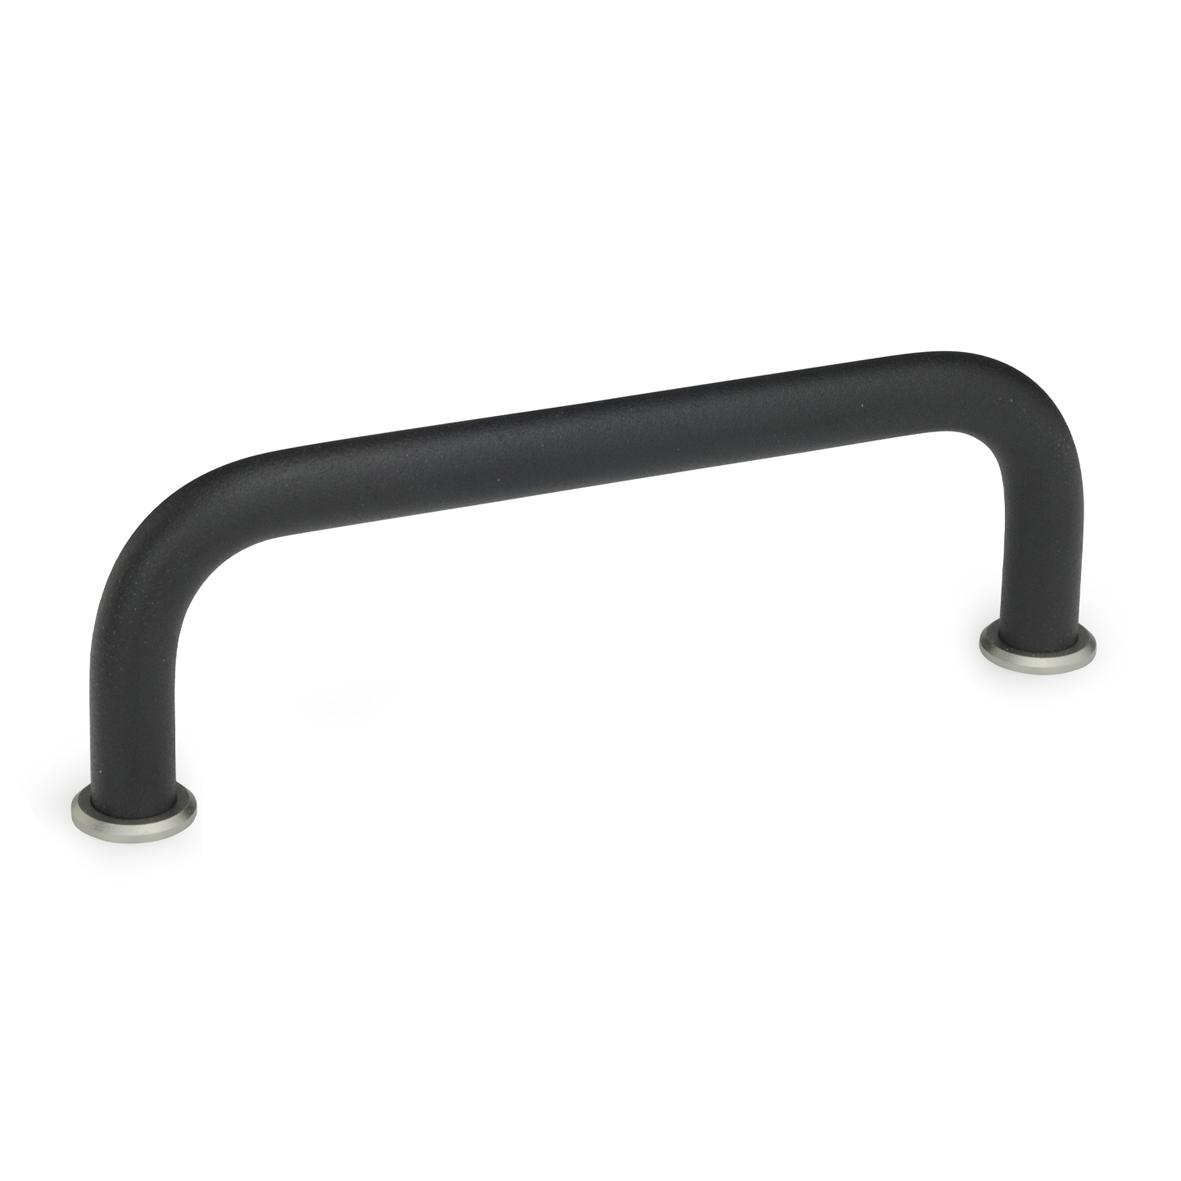 Bügelgriff 425, rund, Aluminium, schwarz, cover